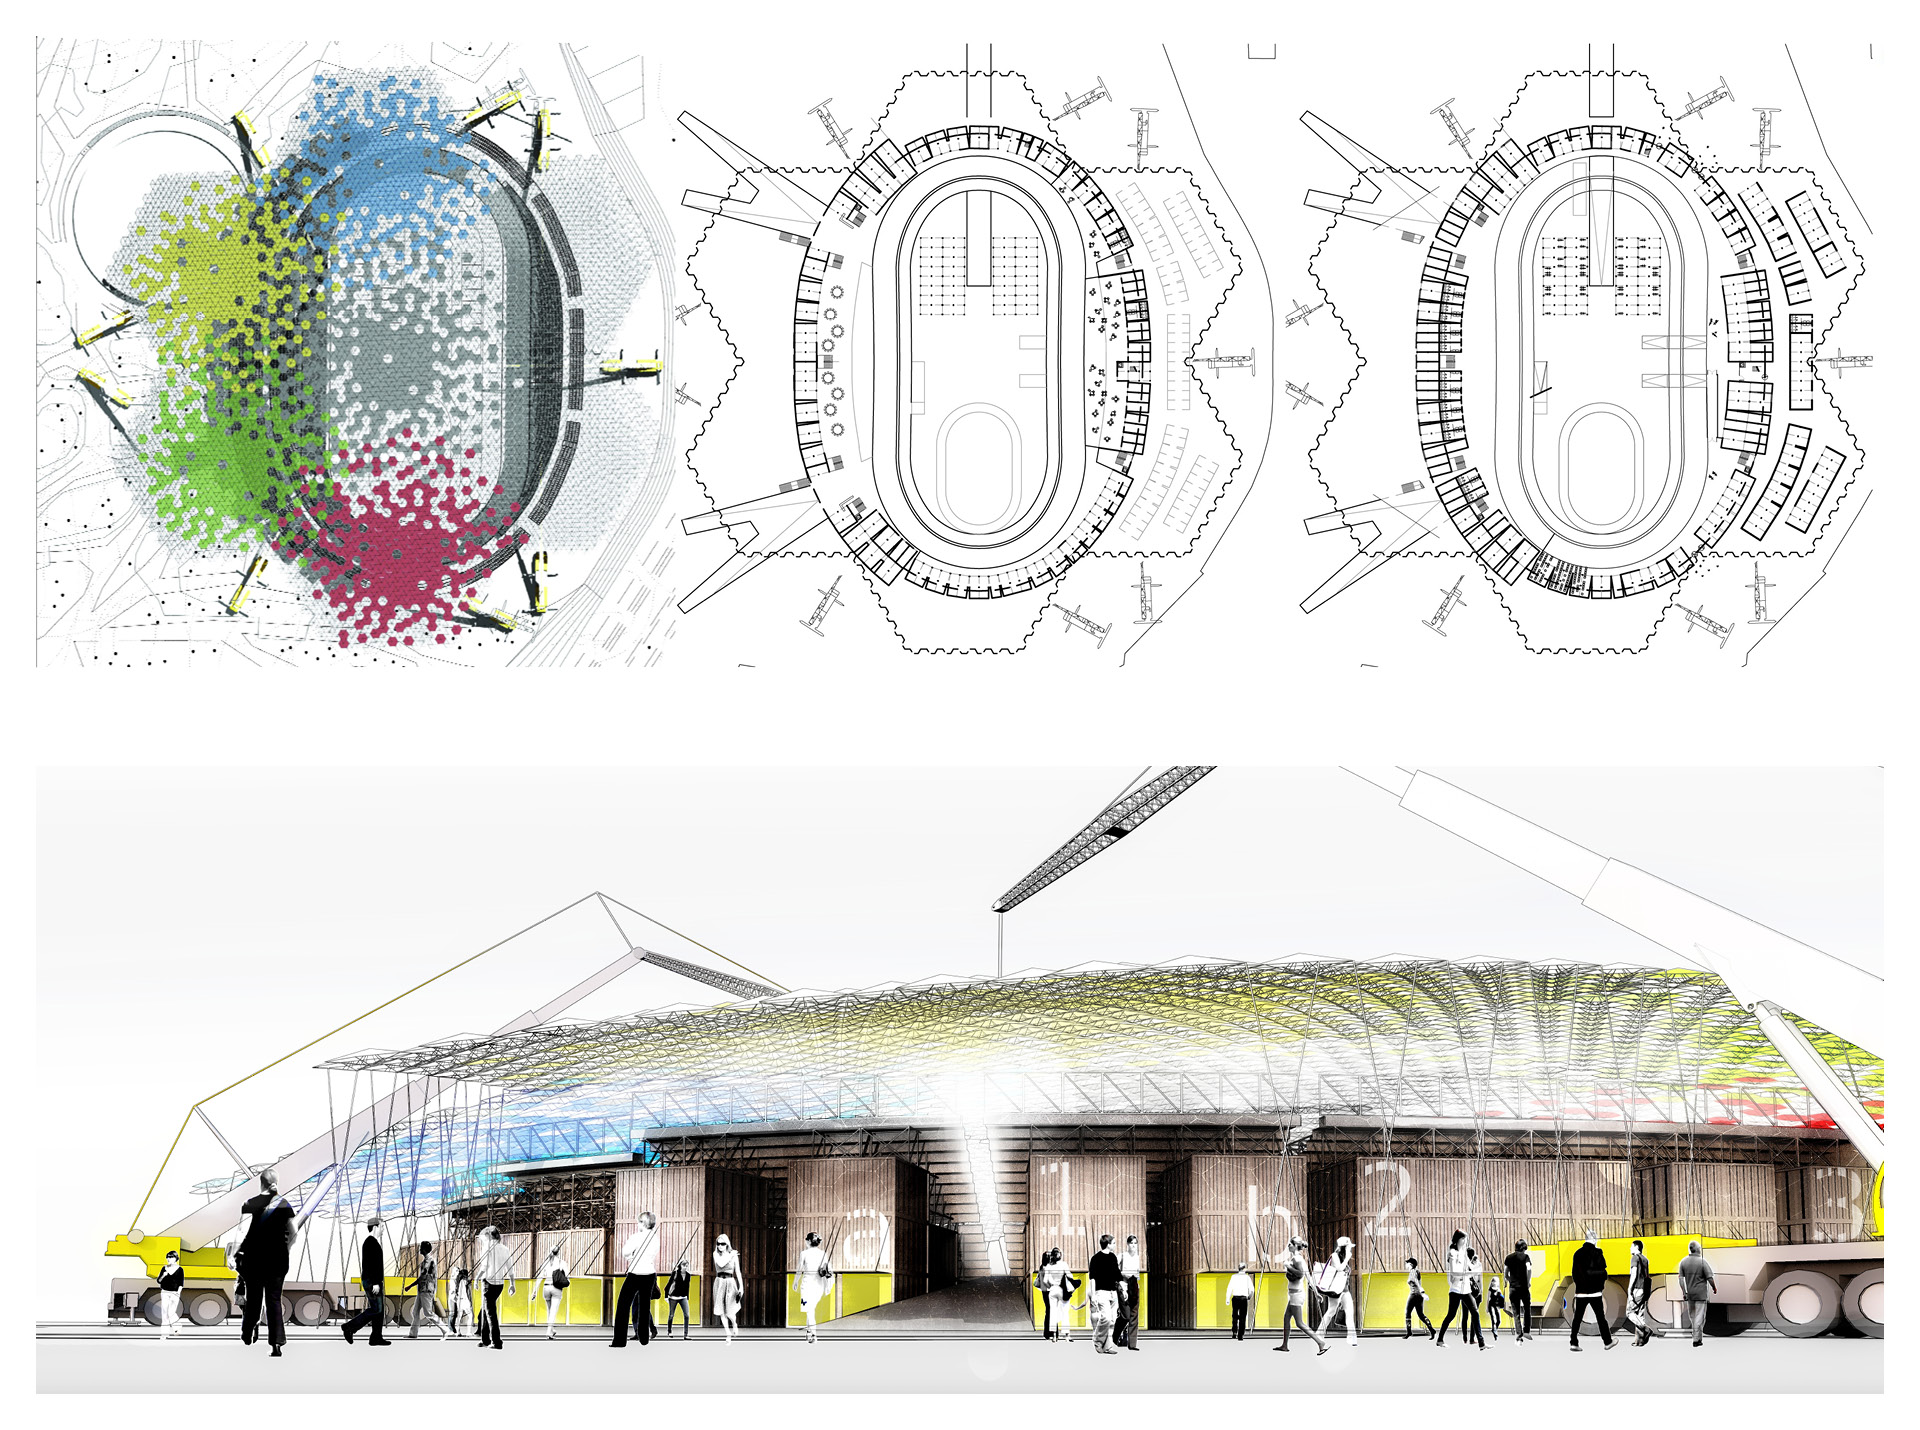 velodromo.competition.architecture.02